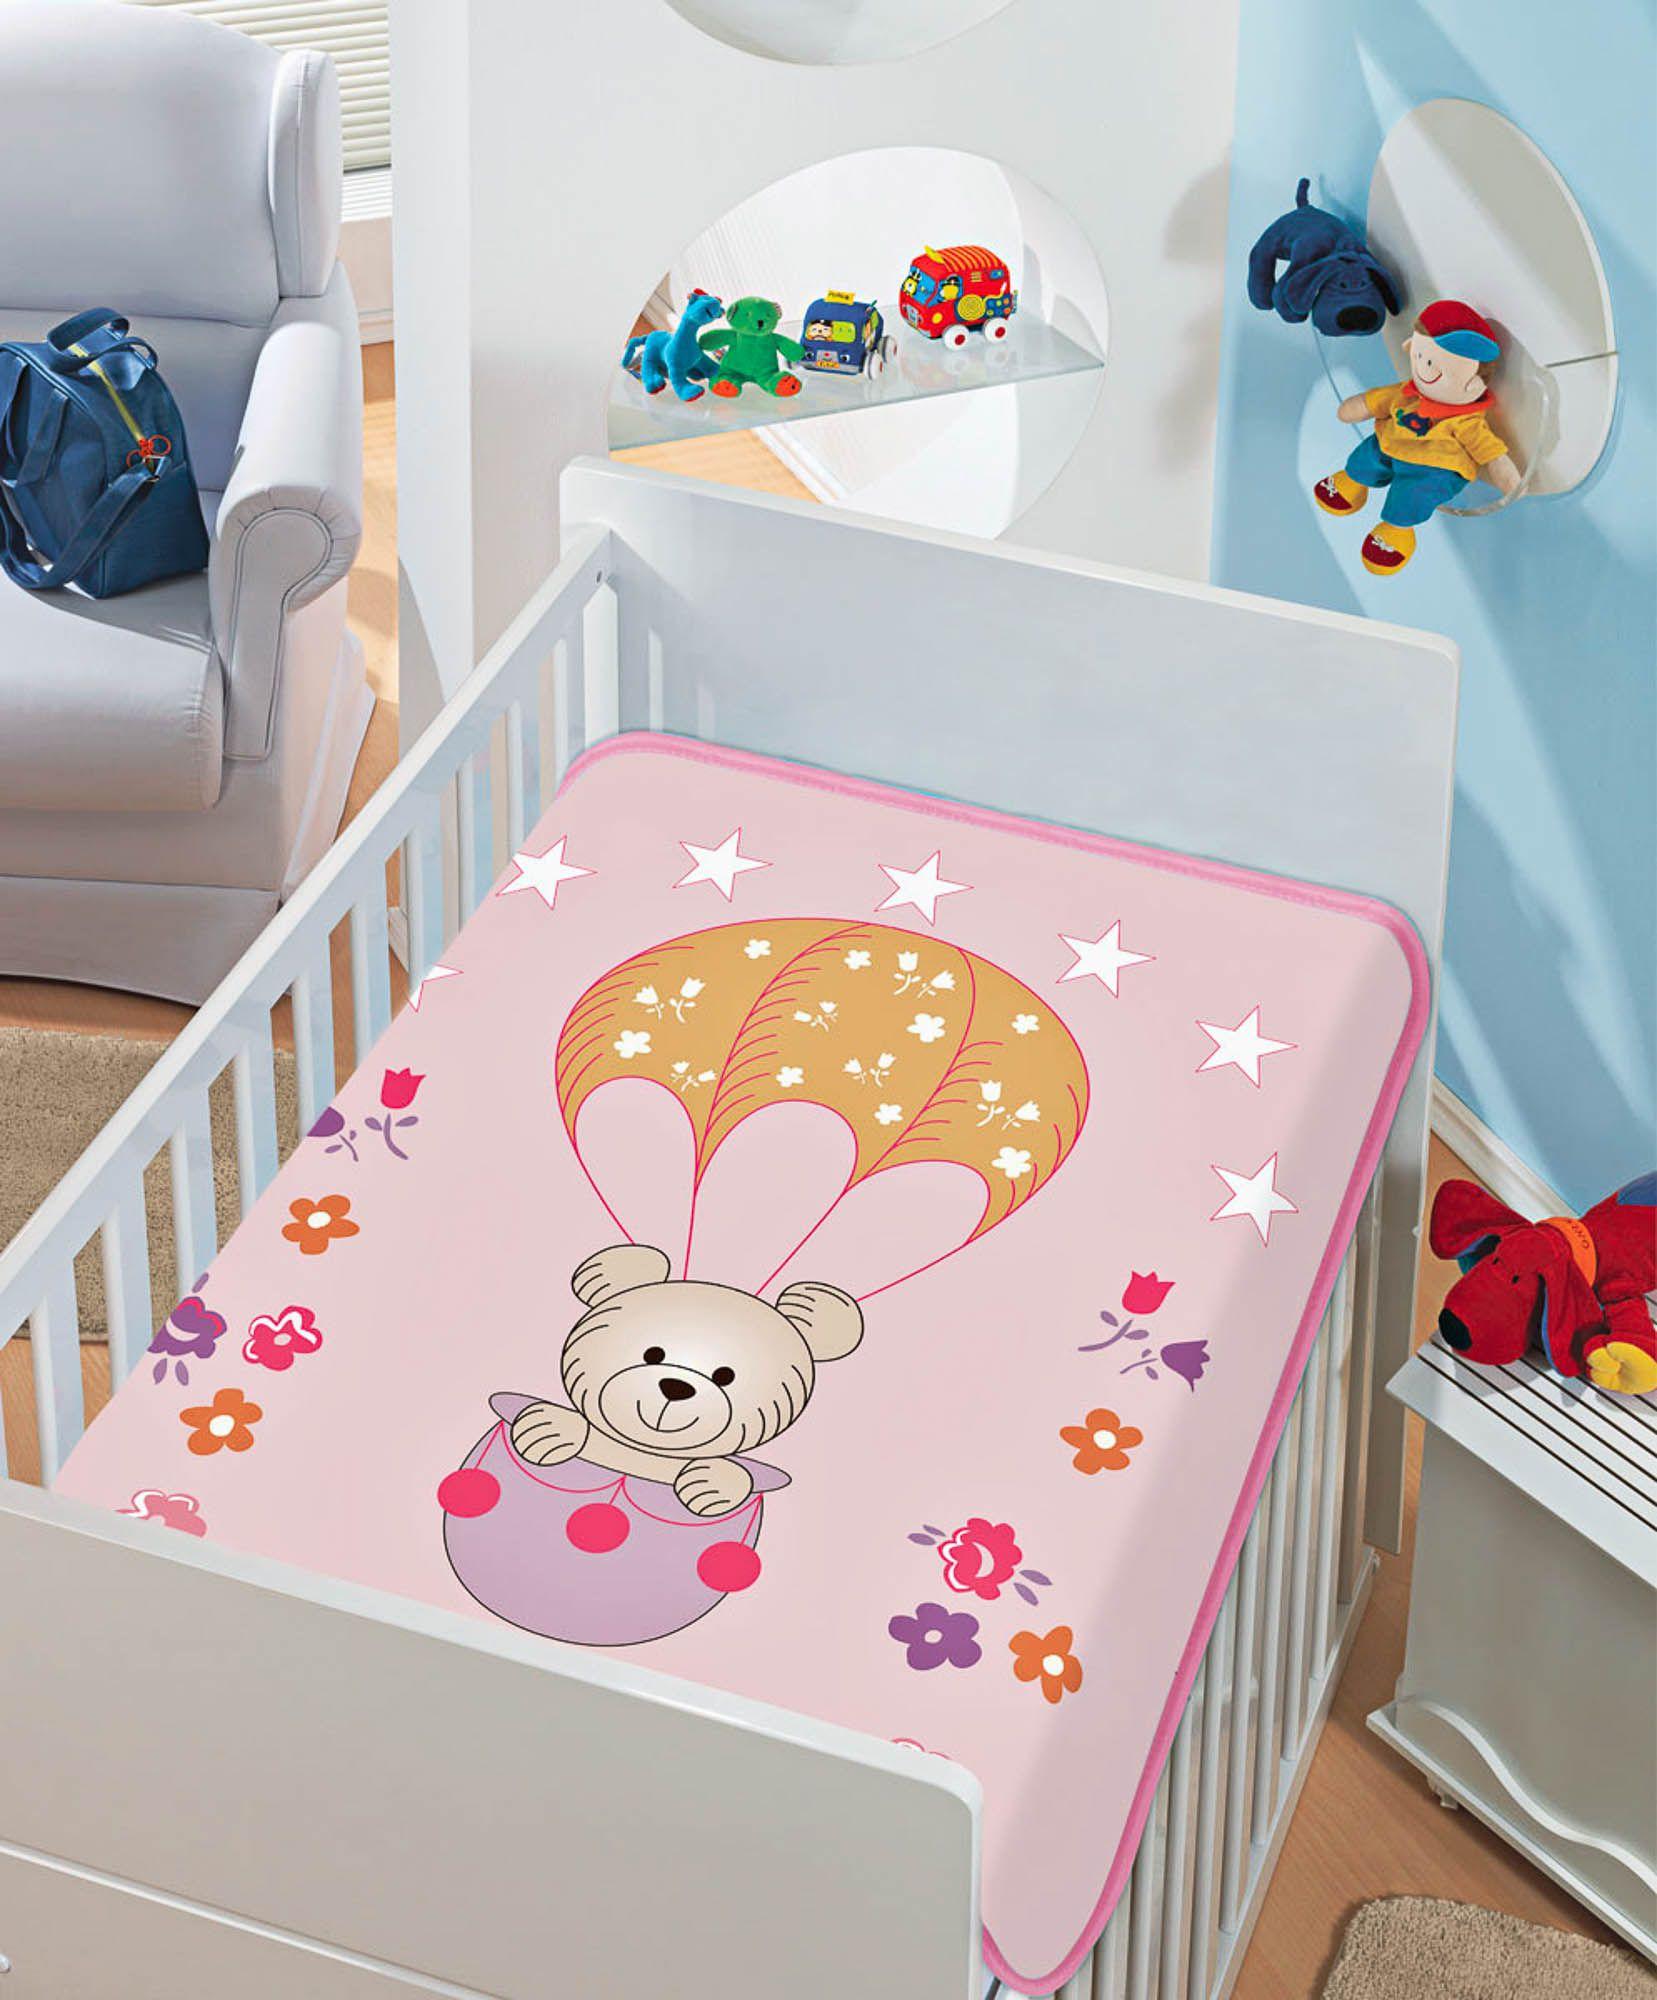 Cobertor Jolitex Raschel Infantil 0,90x1,10m Passeio de Balão Rosa